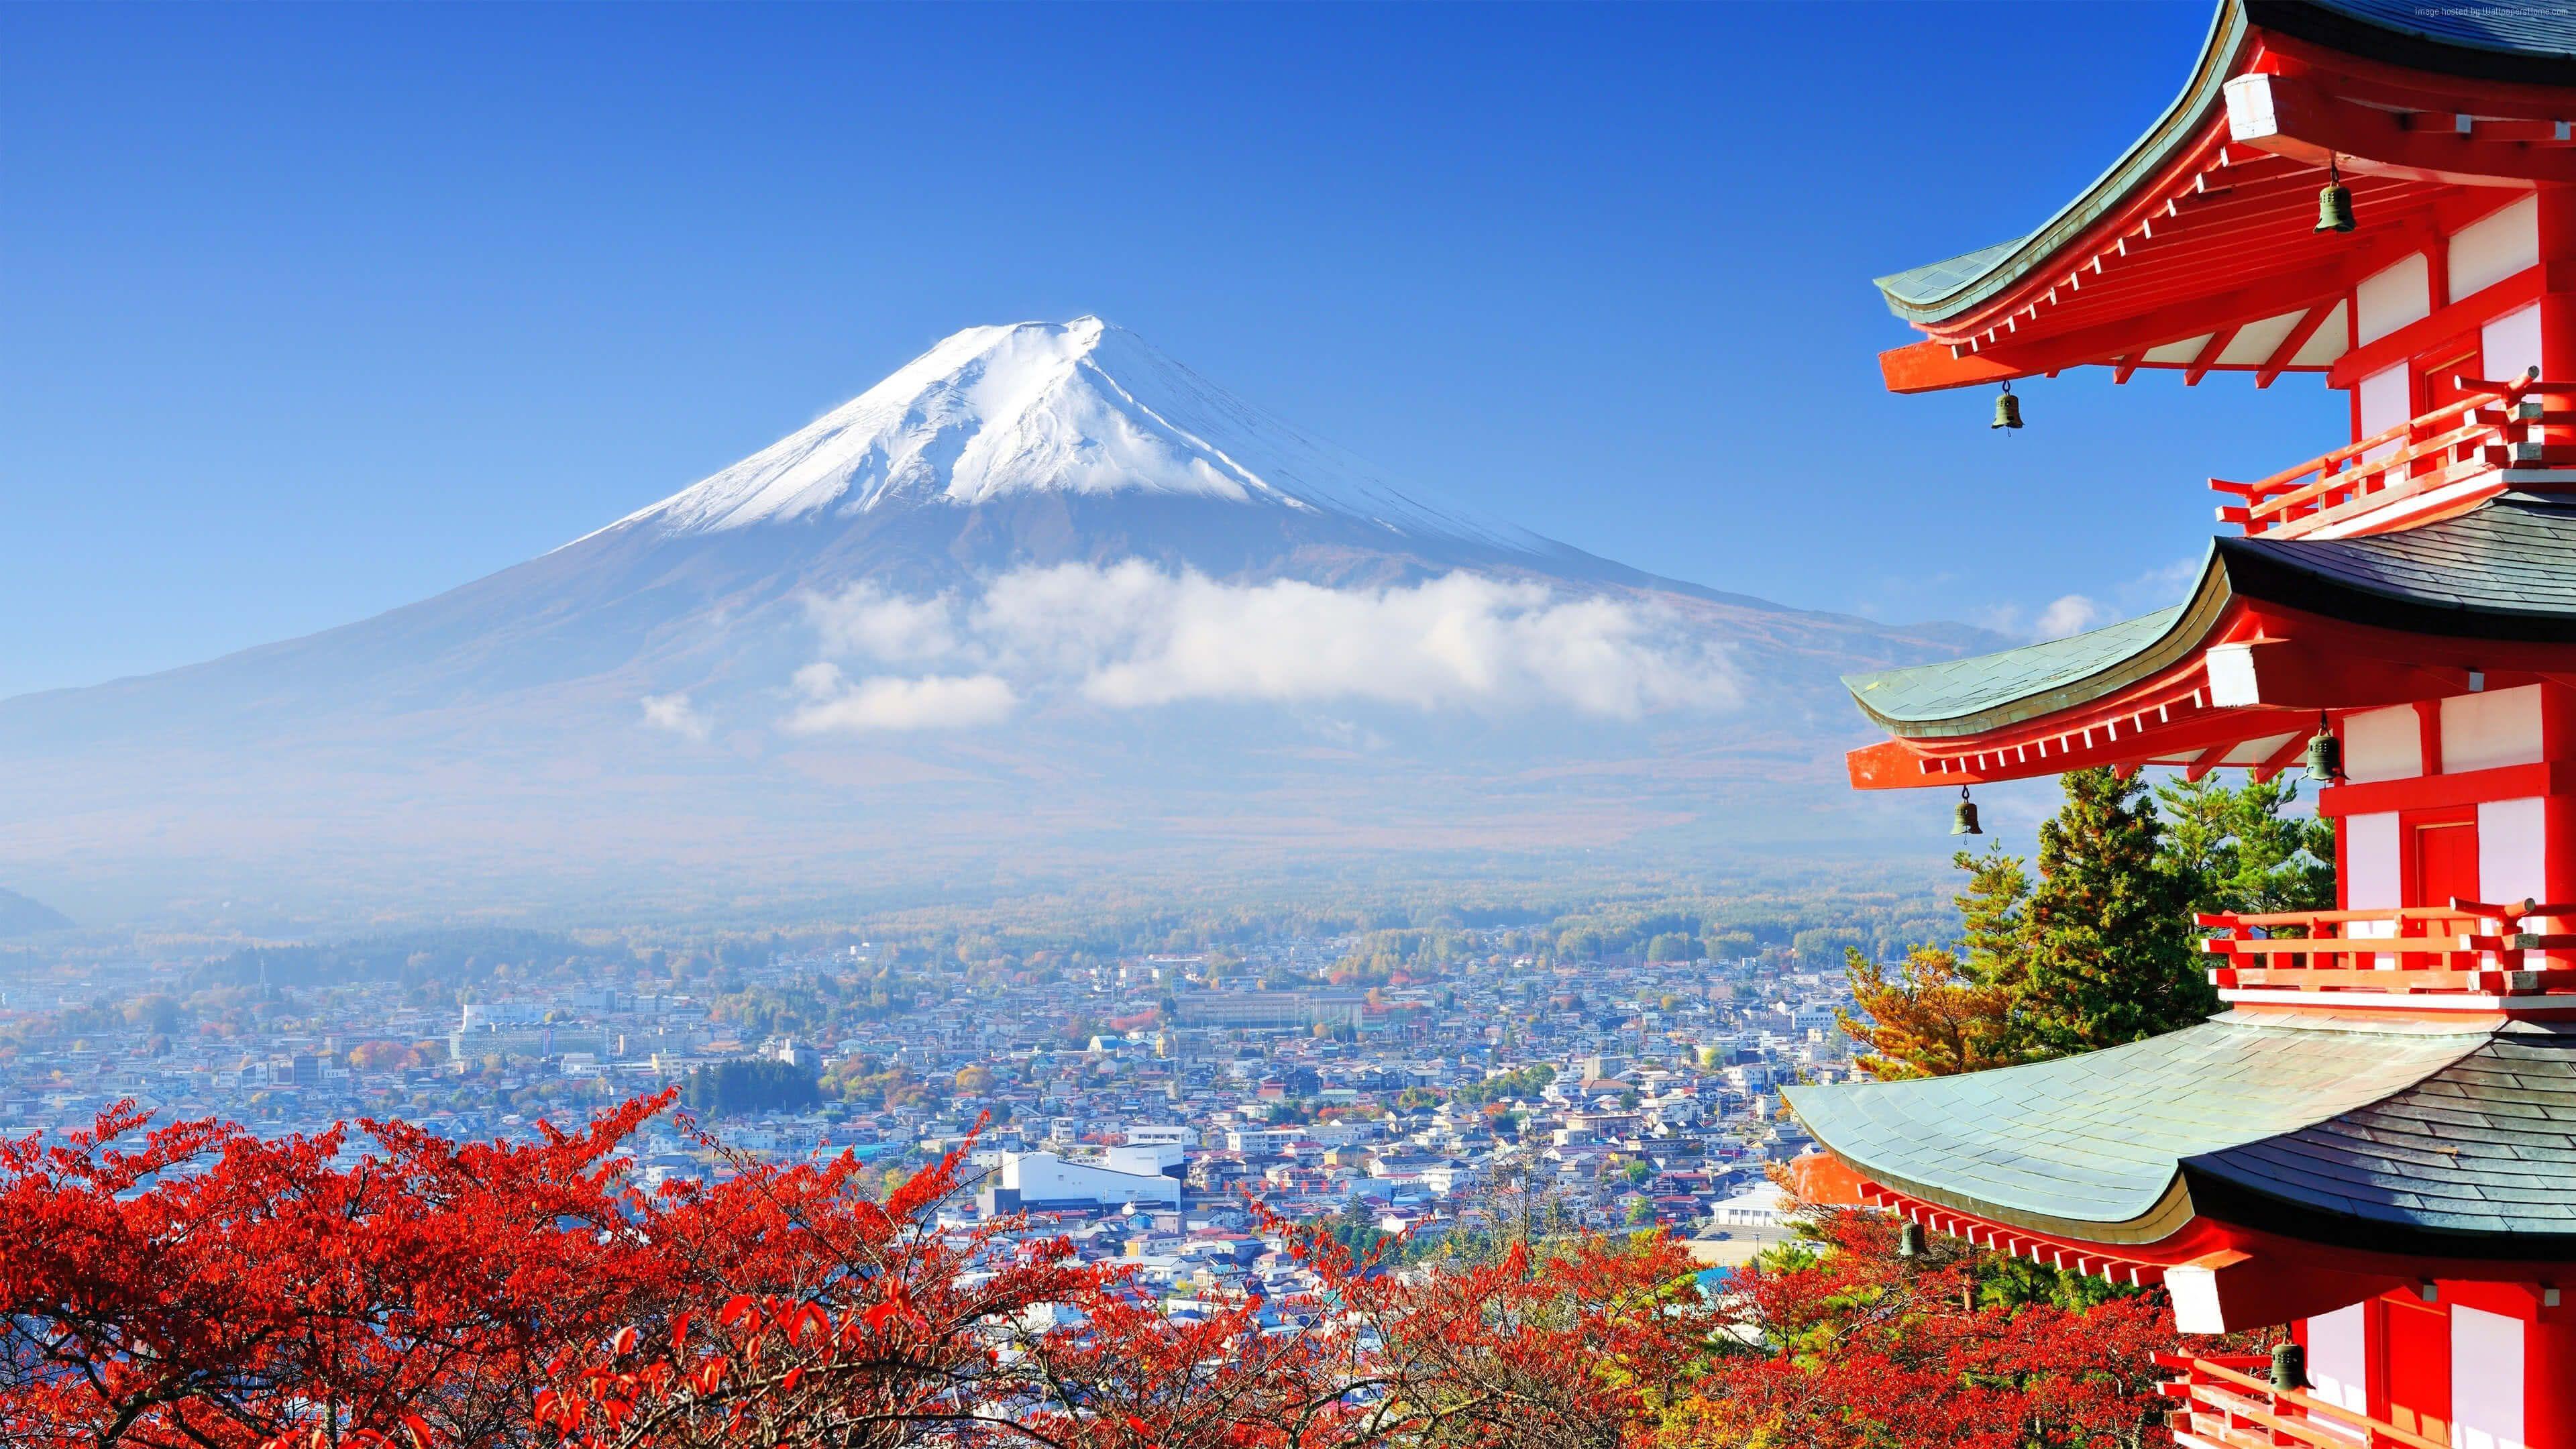 3840x2160 View Of Mount Fuji From A Red Pagoda Tokyo Uhd 4k Wallpaper Pixelz Japan Tourist Mount Fuji Japan Japan Travel